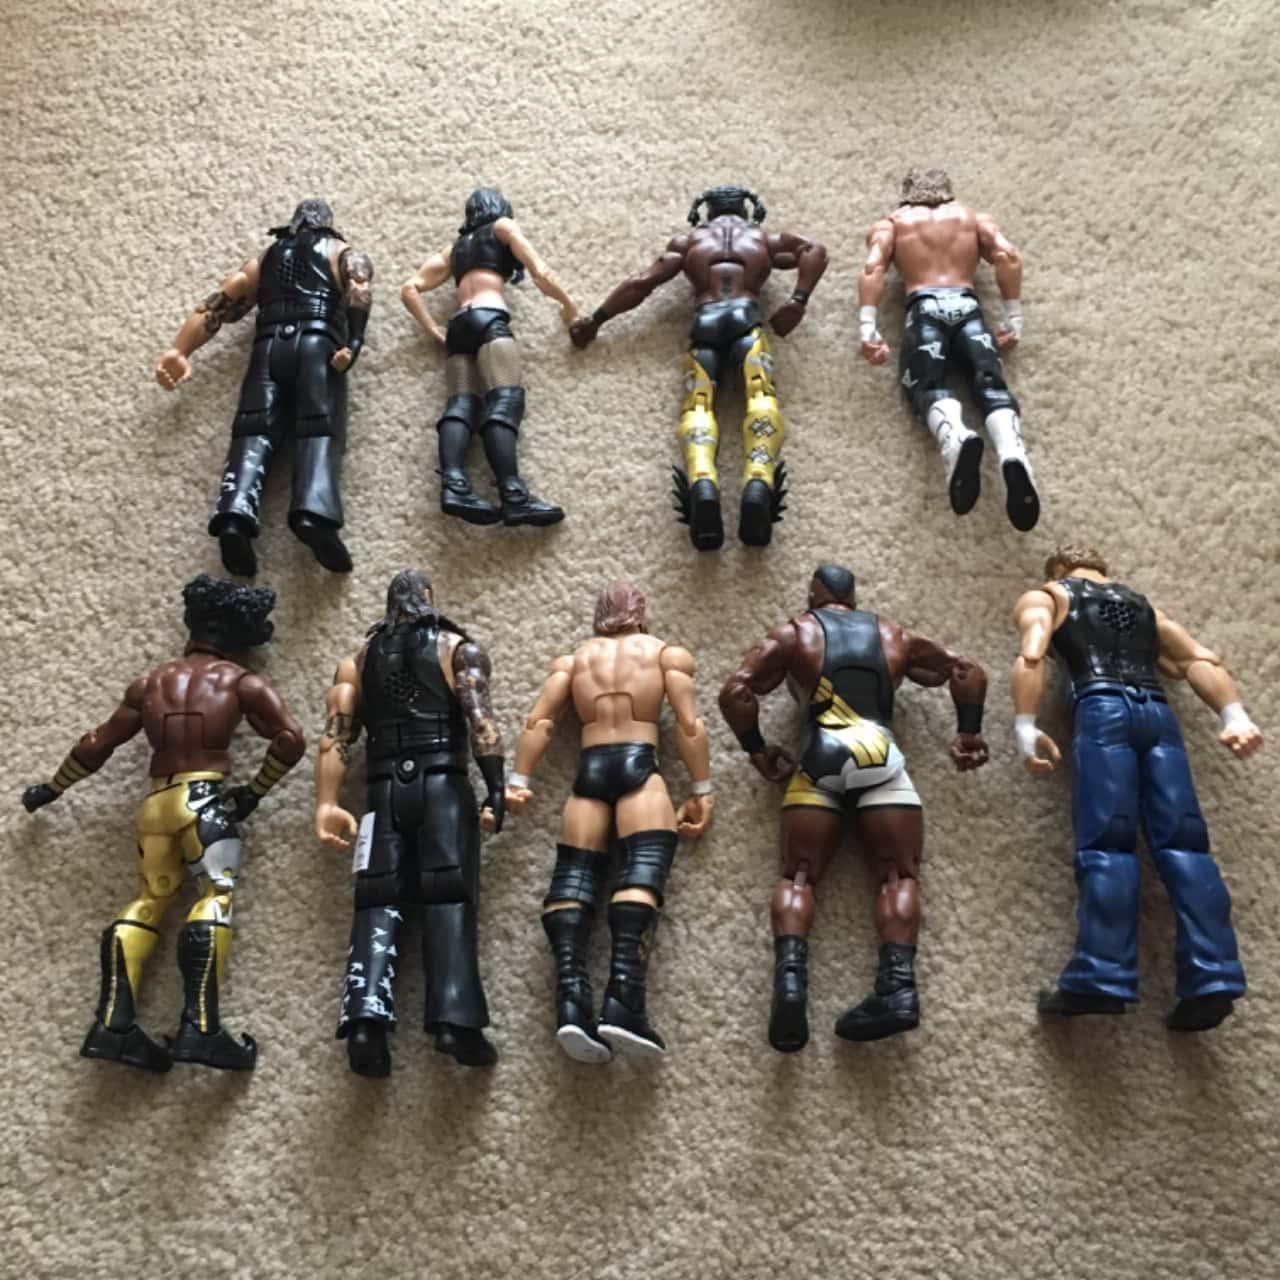 WWF Figurines - 9 pcs (Toys)